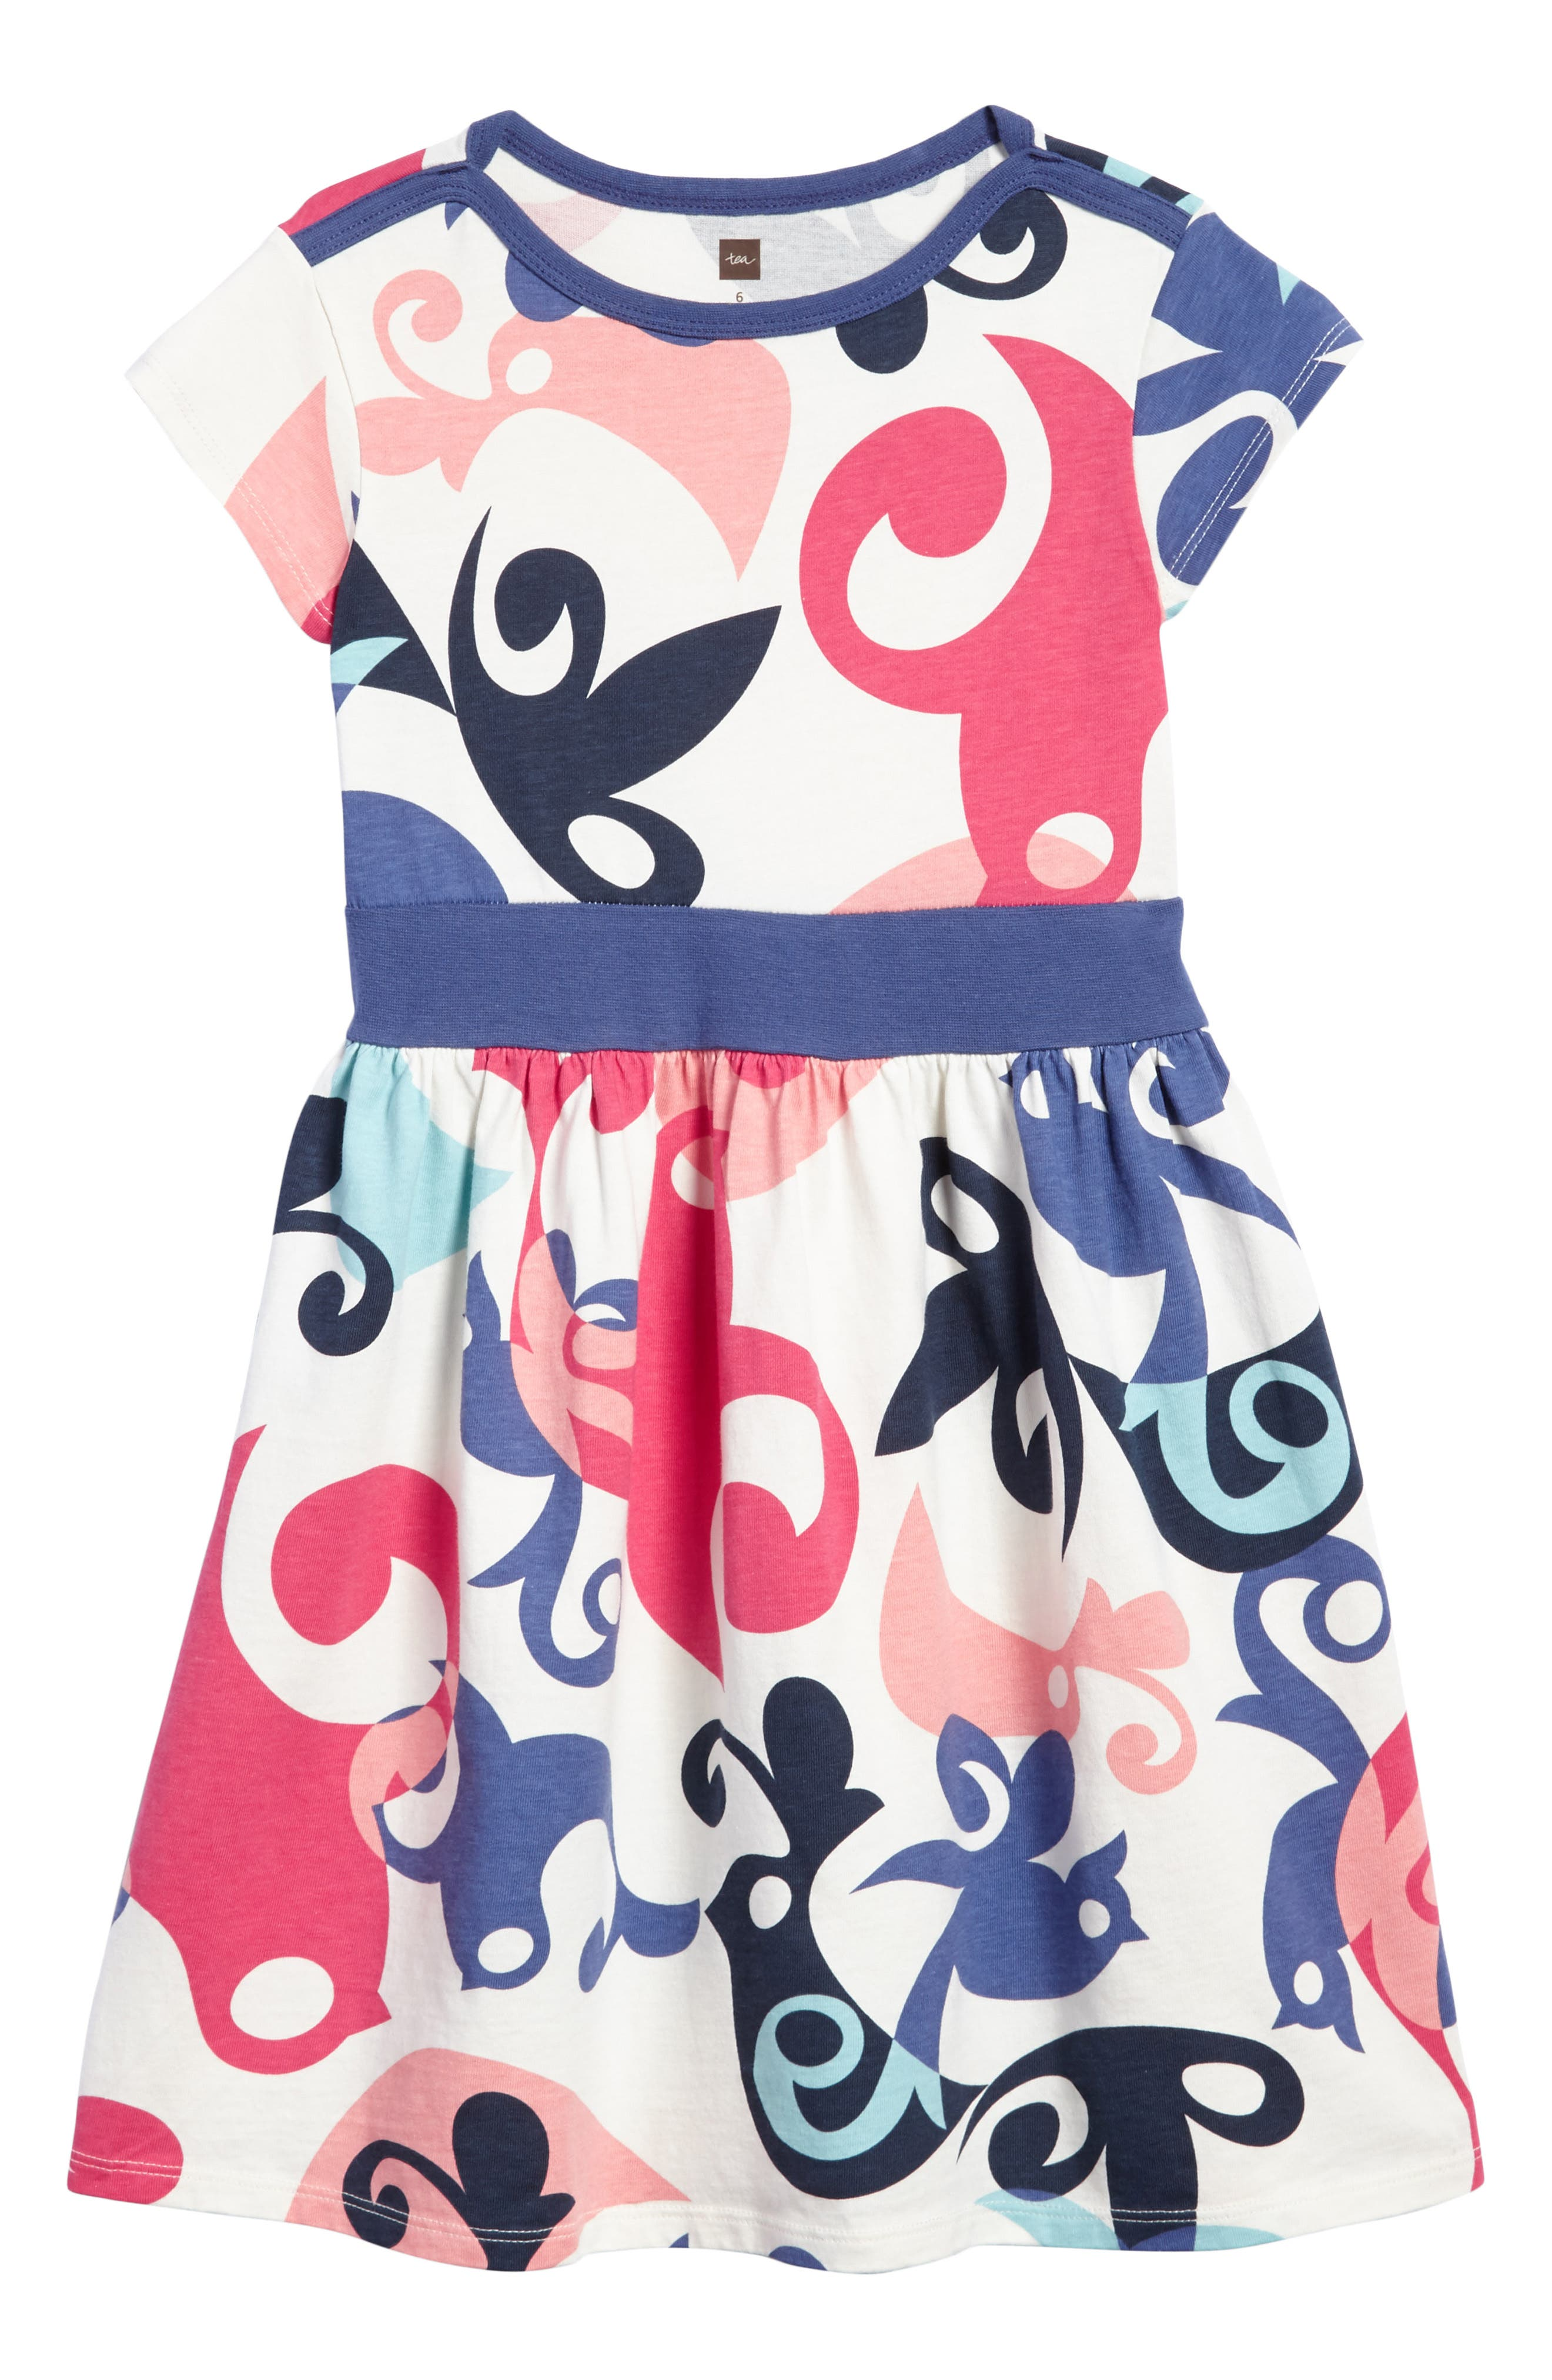 Alternate Image 1 Selected - Tea Collection Tweet Dress (Toddler Girls, Little Girls & Big Girls)